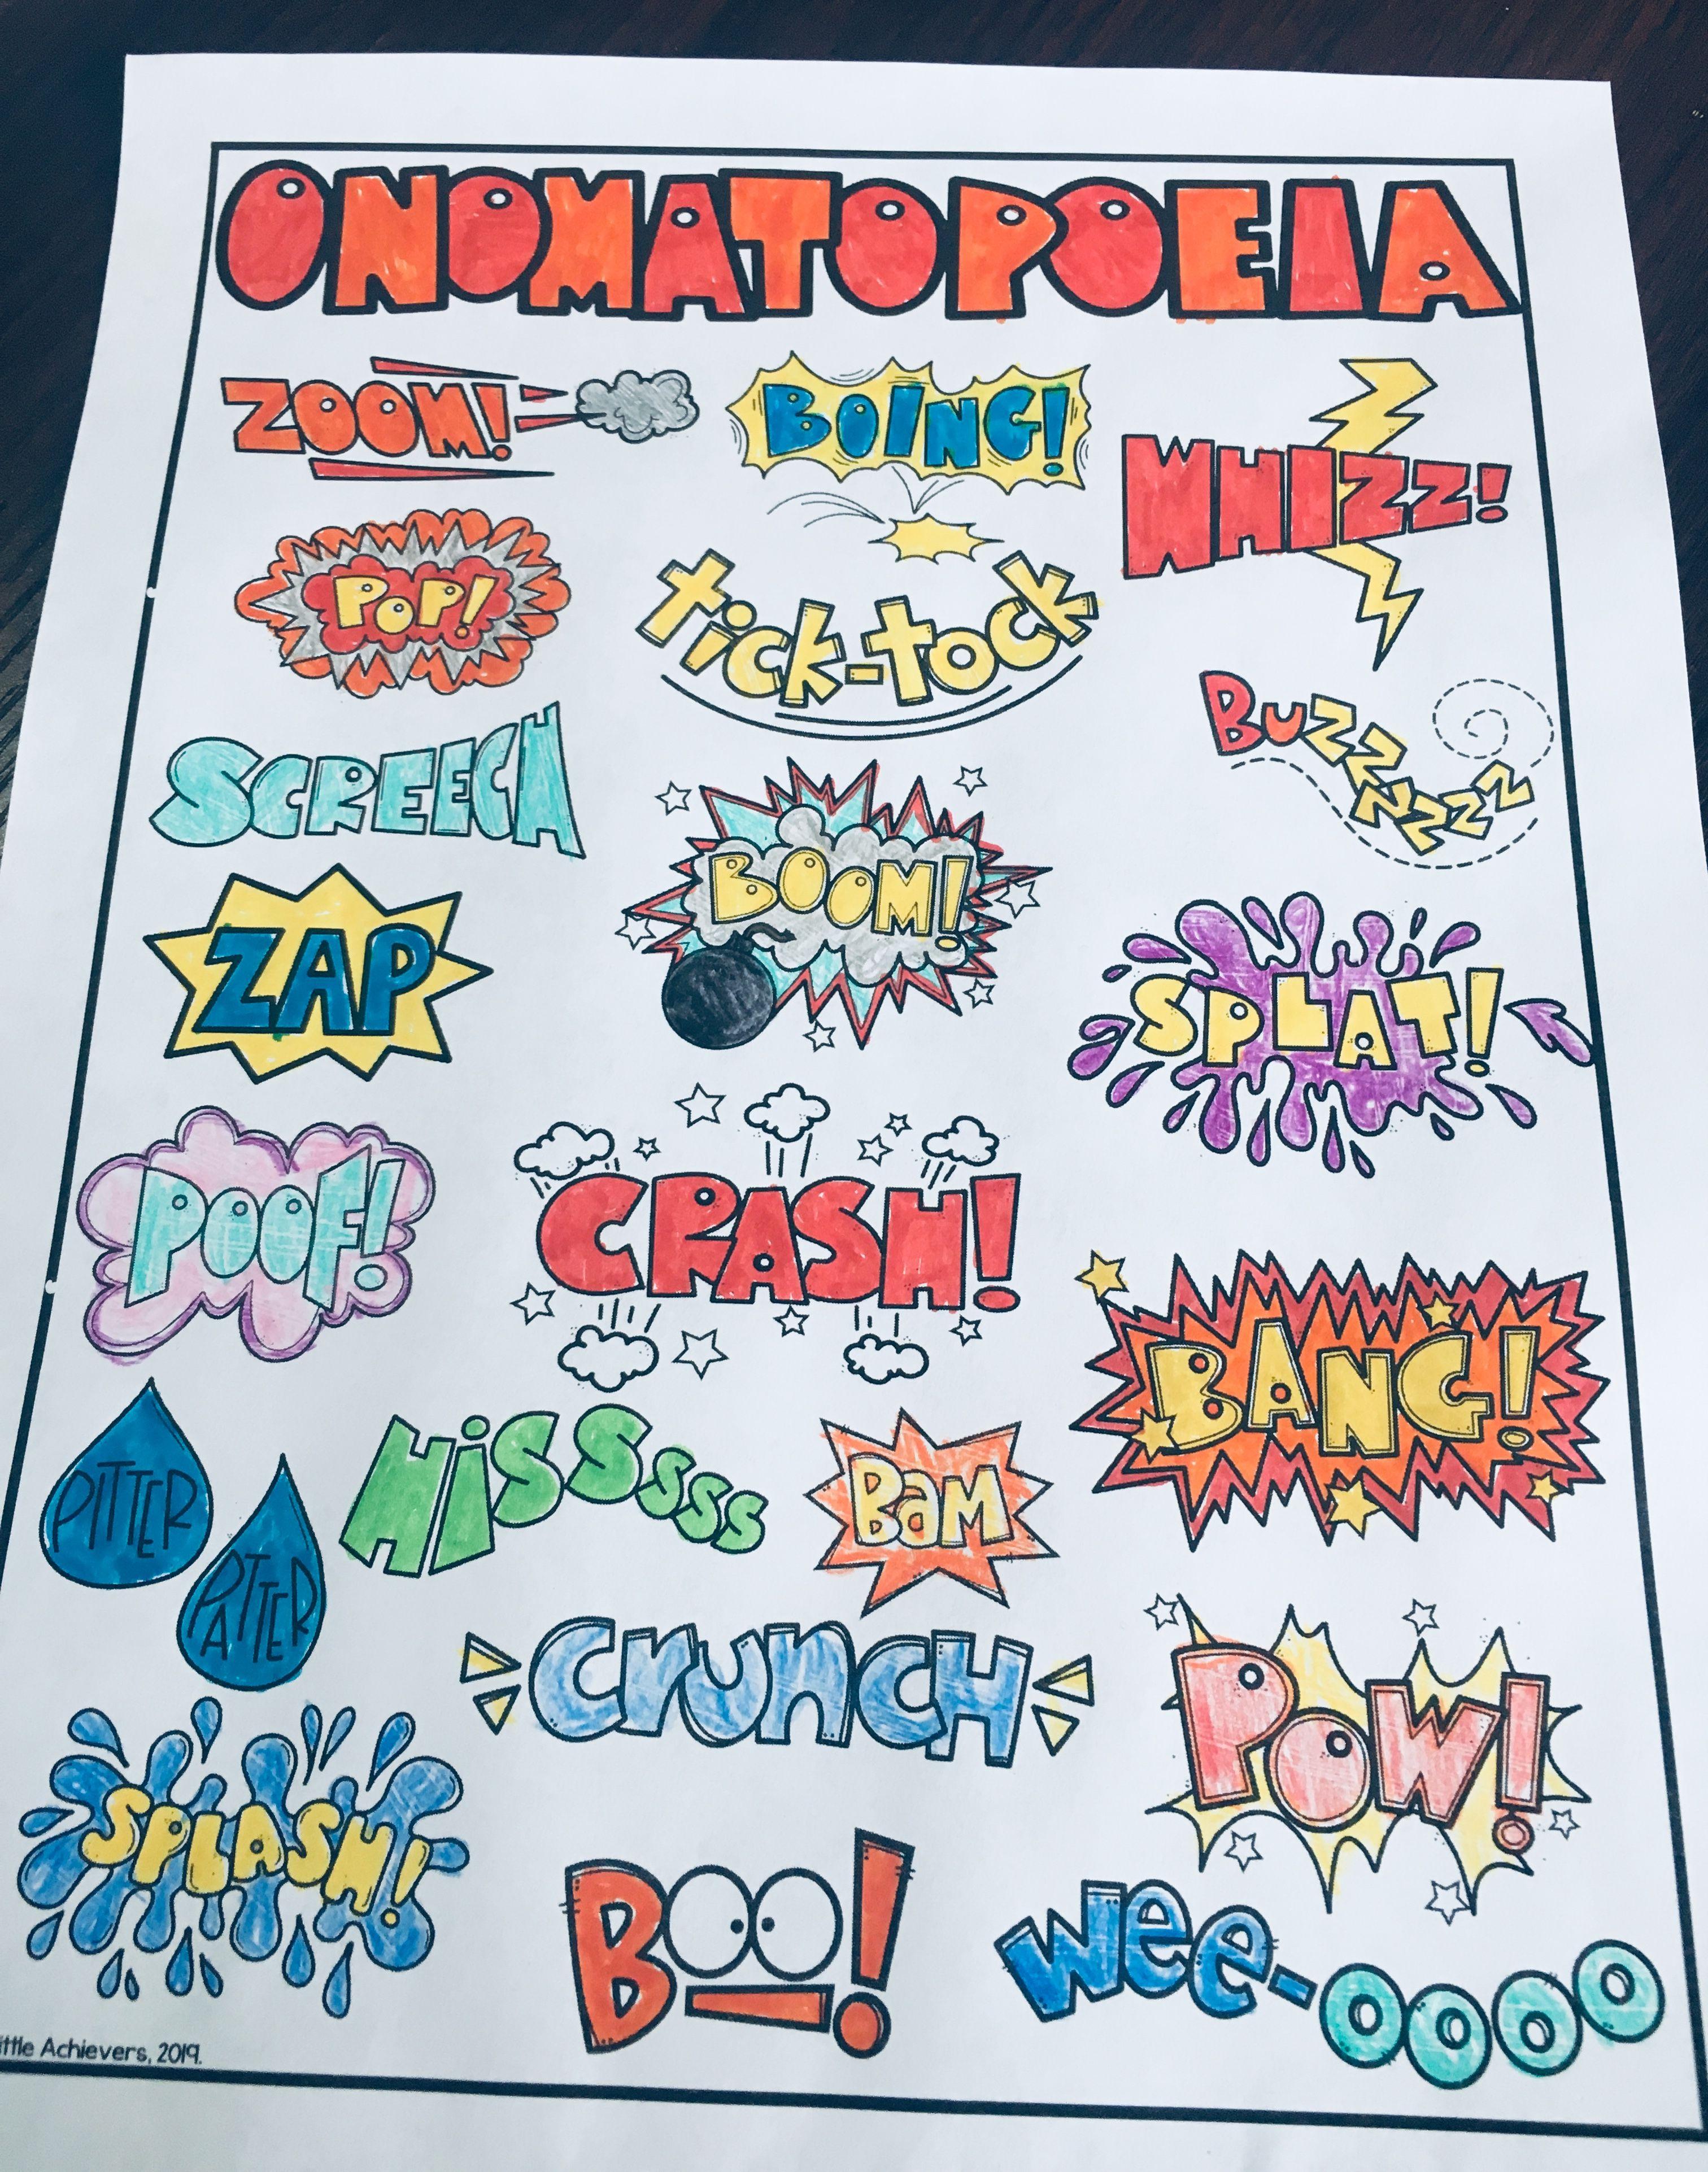 Onomatopoeia Words With Pictures